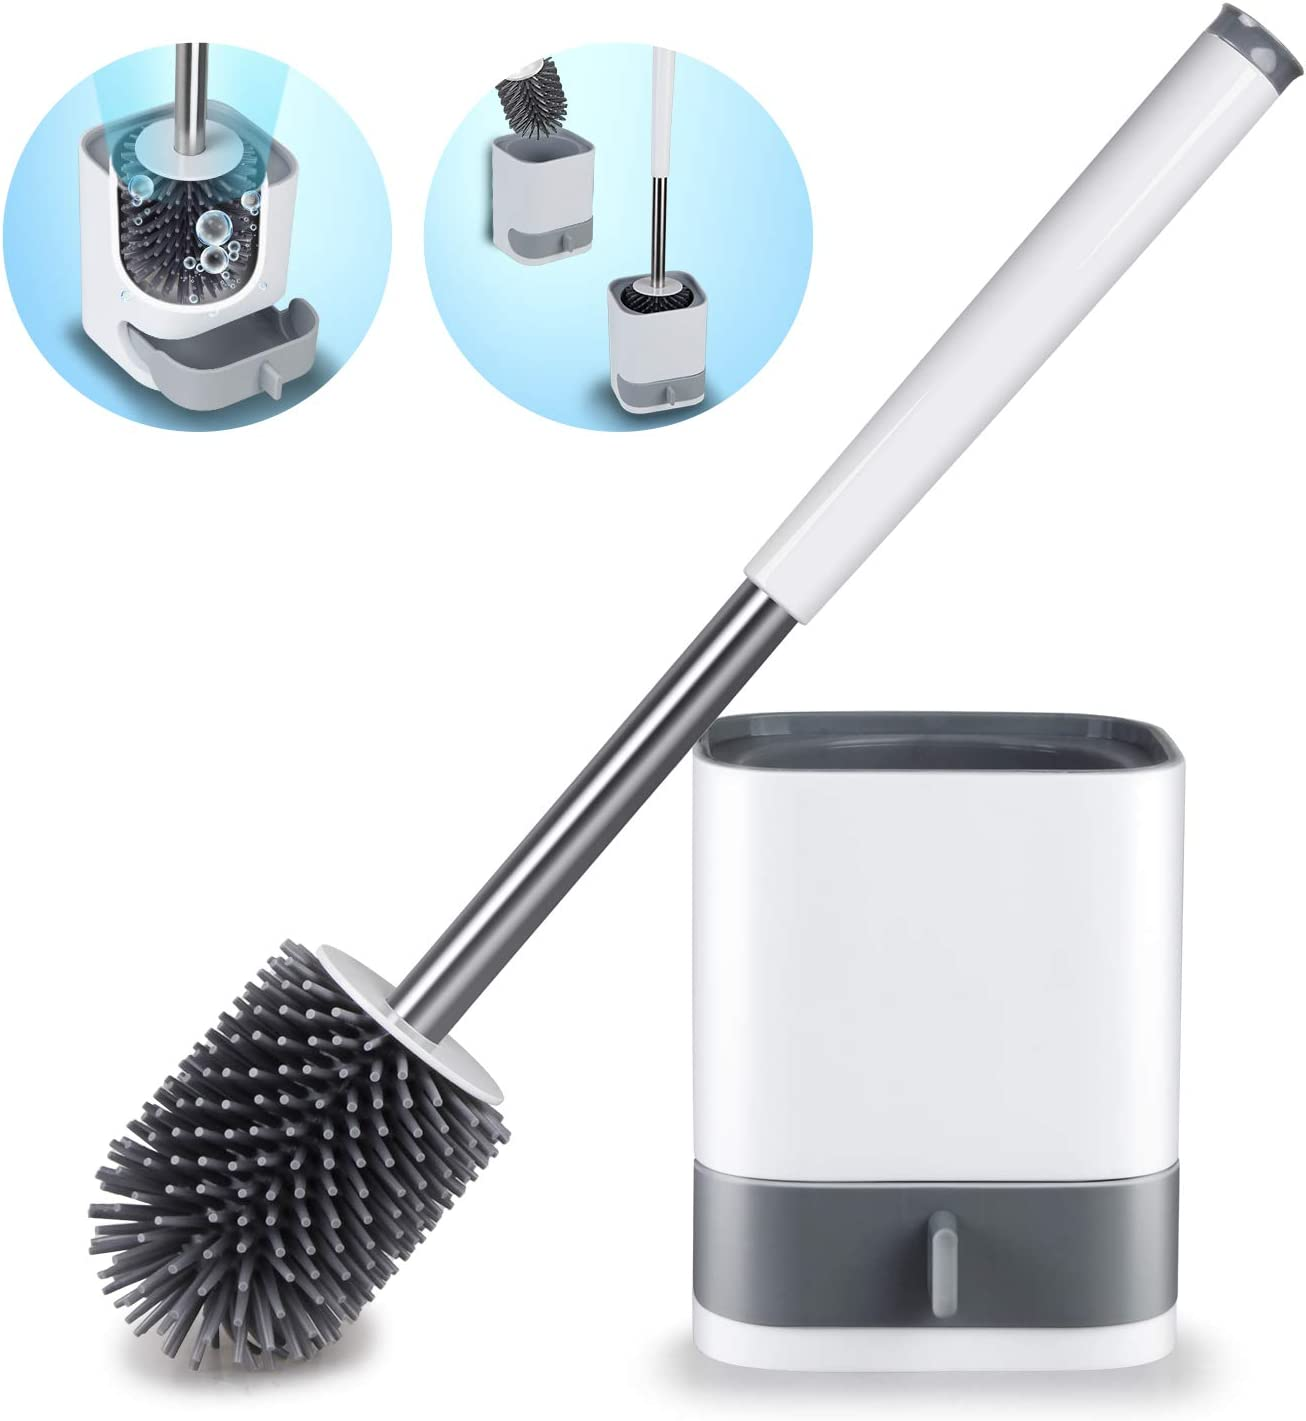 Soft Silicone Toilet Brush and Holder Set Bristle Toilet Bowl Brush For Bathroom